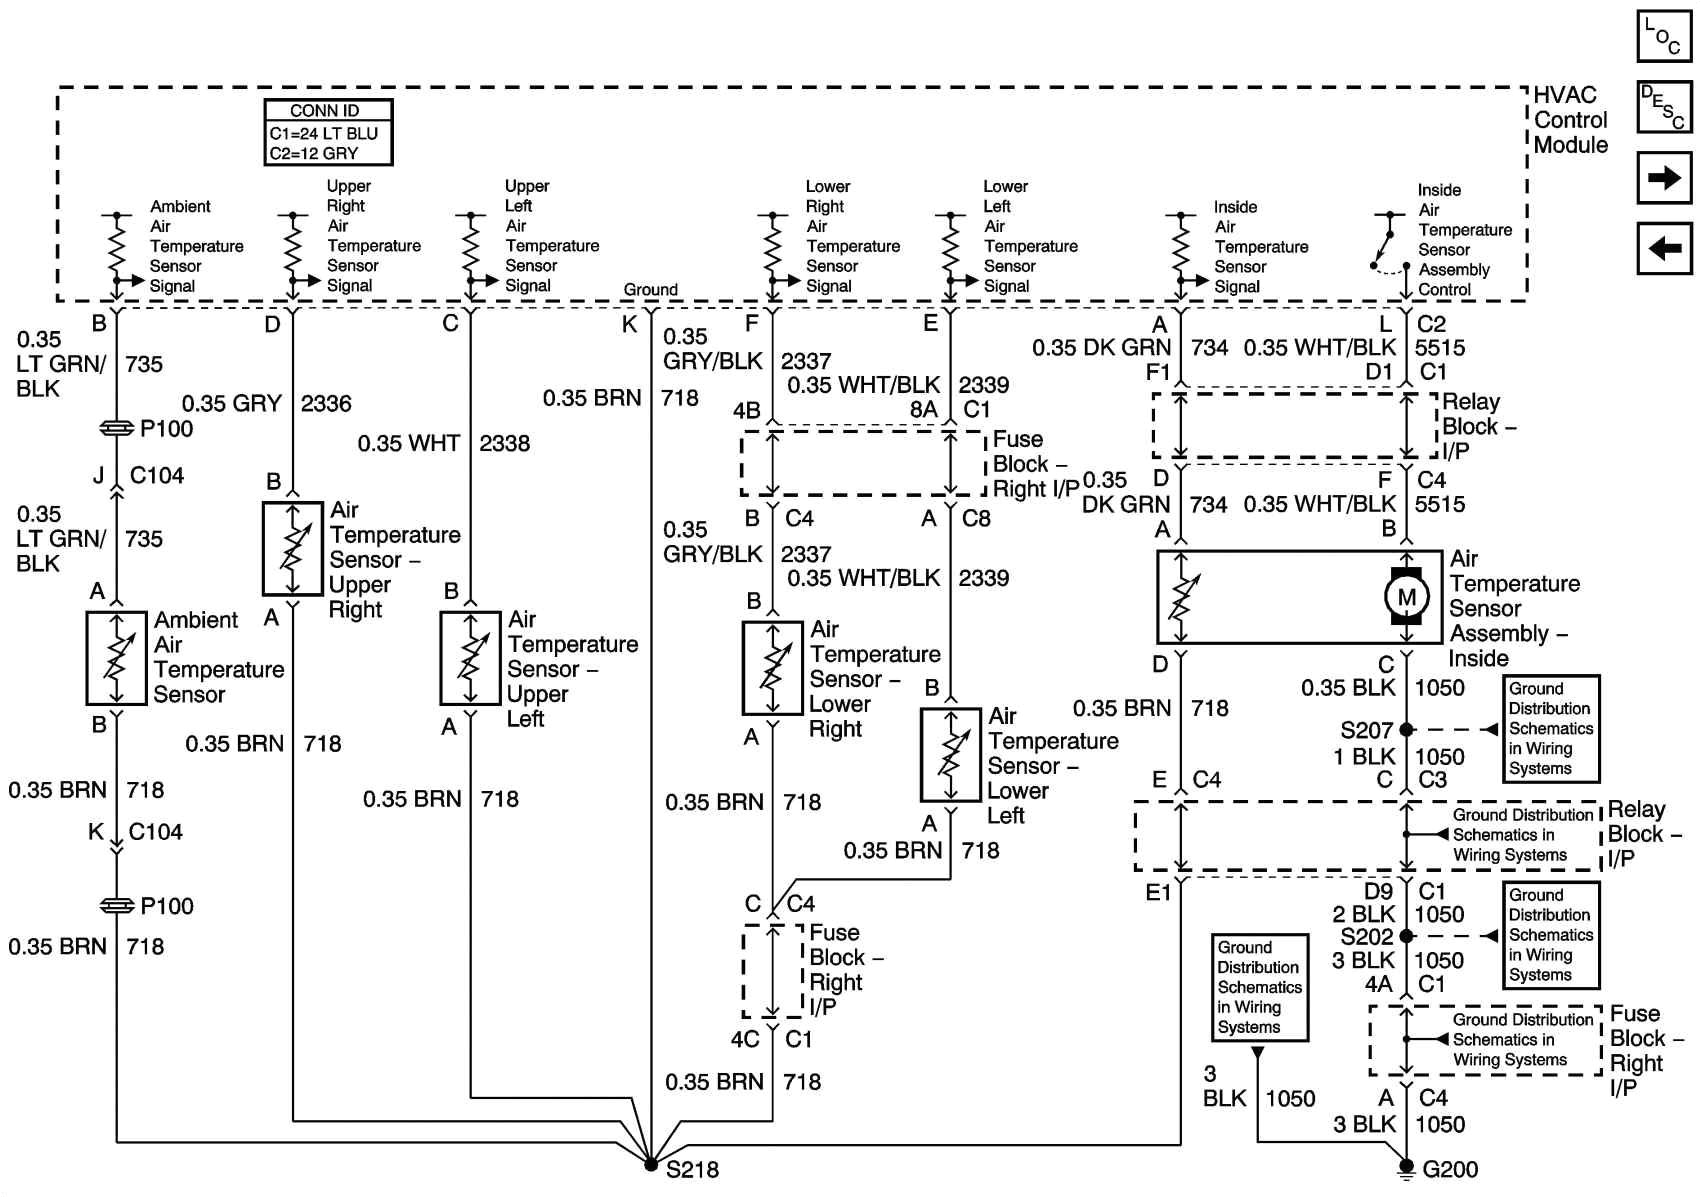 2001 chevy malibu radio wiring diagram book of 2011 tahoe